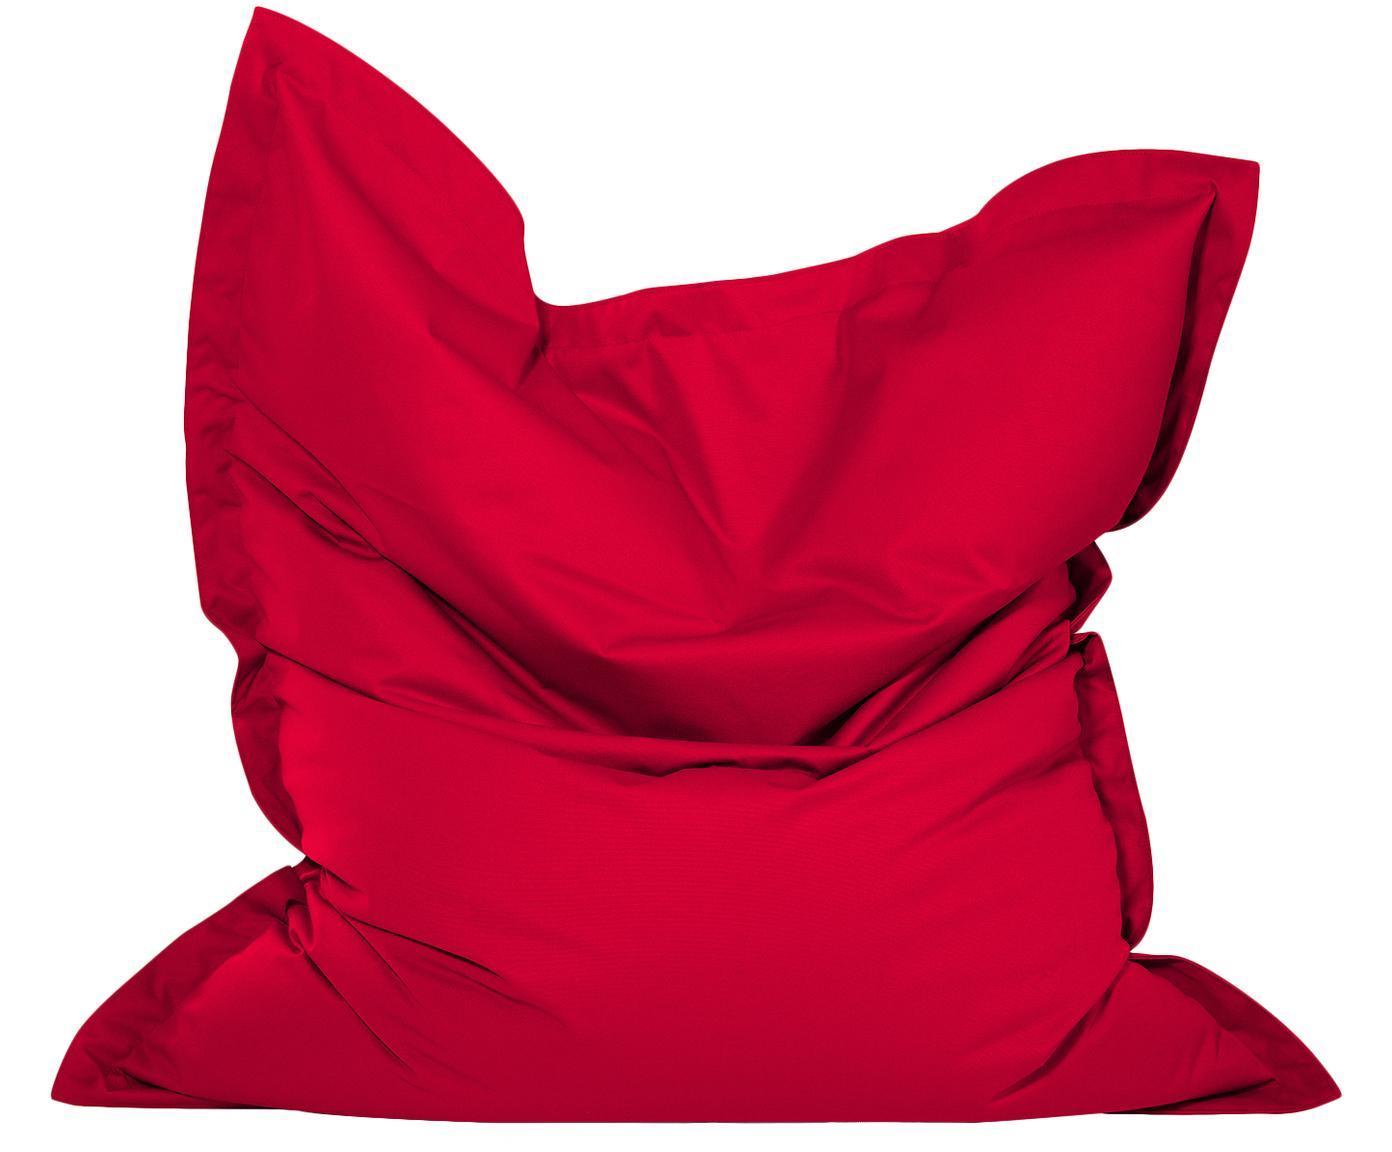 Großer Sitzsack Meadow, Bezug: Polyester, polyurethanbes, Rot, 130 x 160 cm